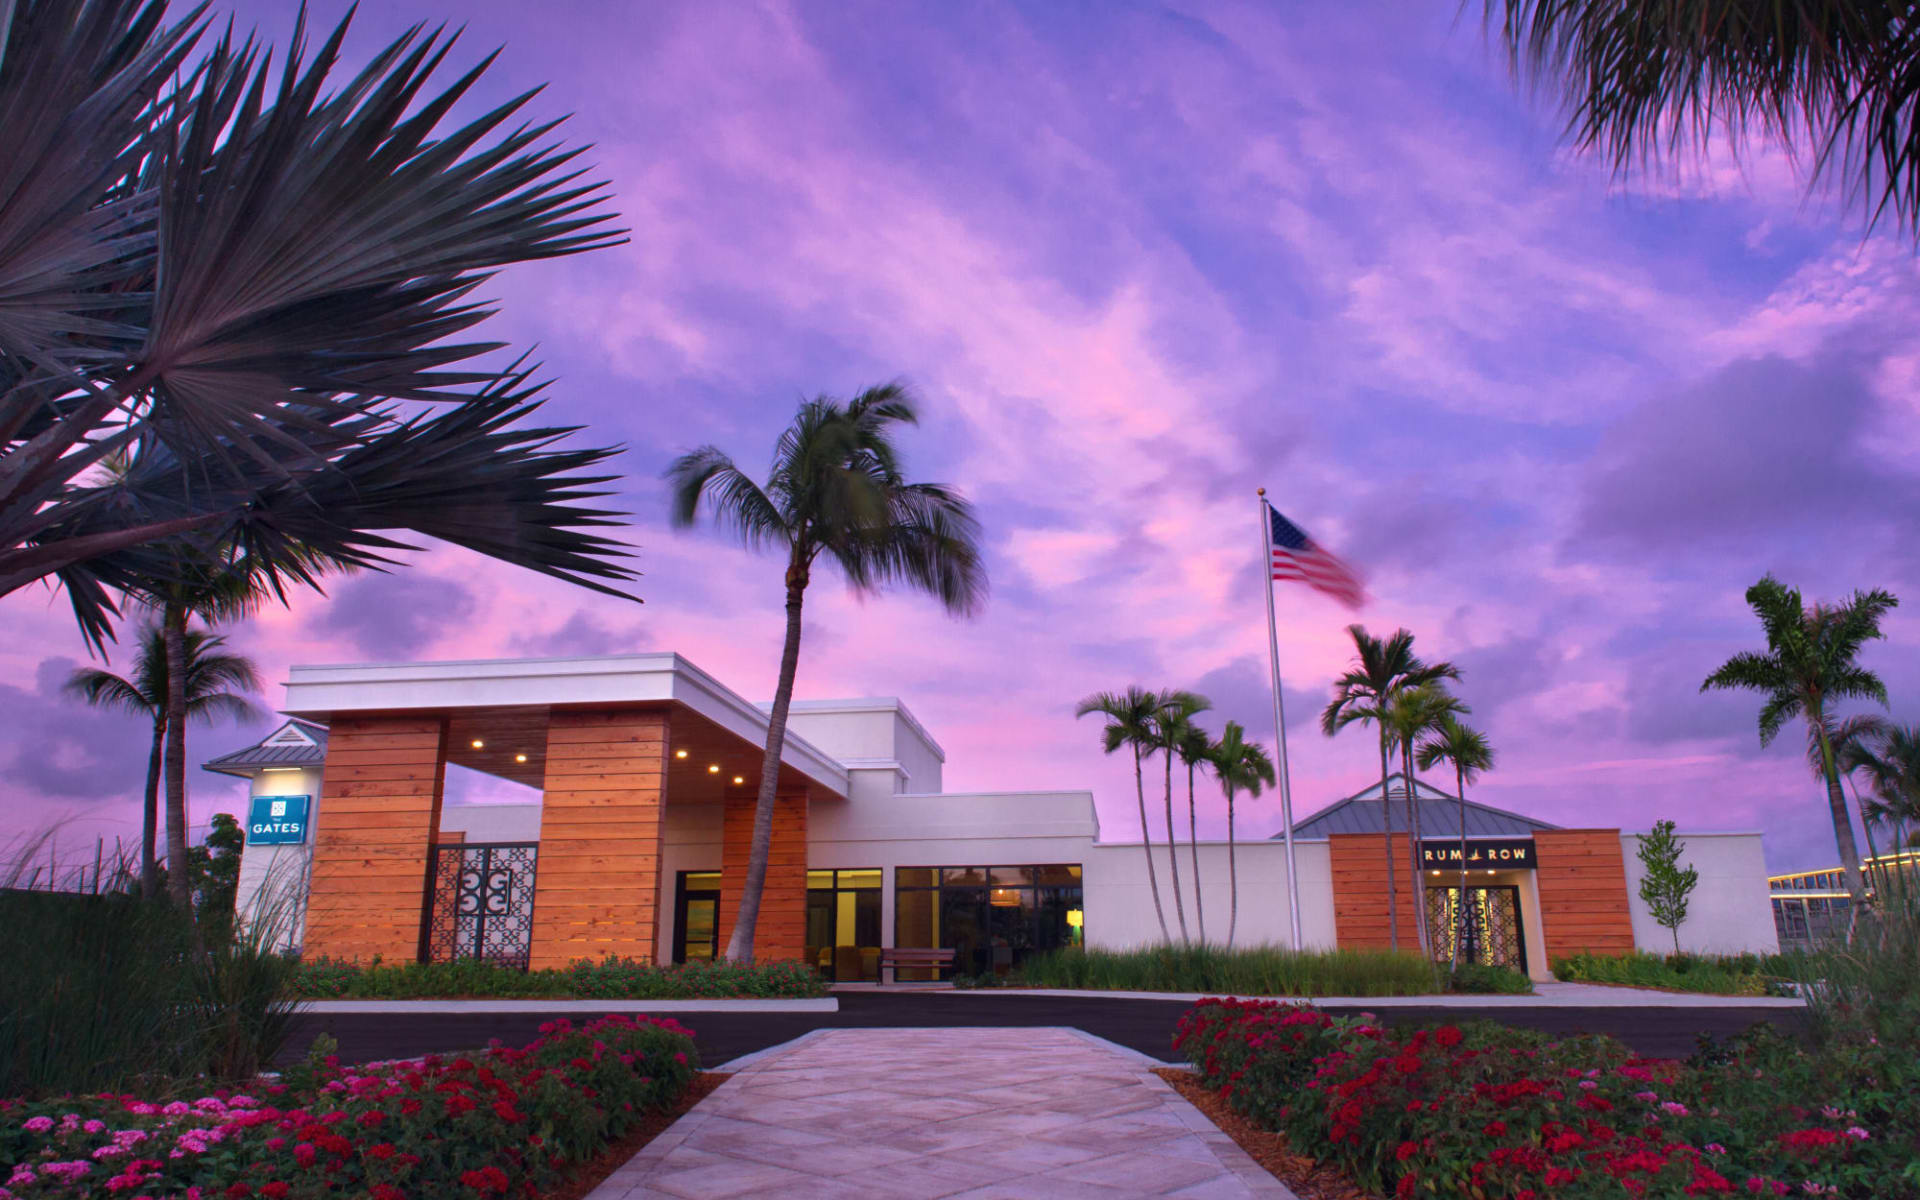 The Gates Hotel Key West:  The Gates_dramatic sky